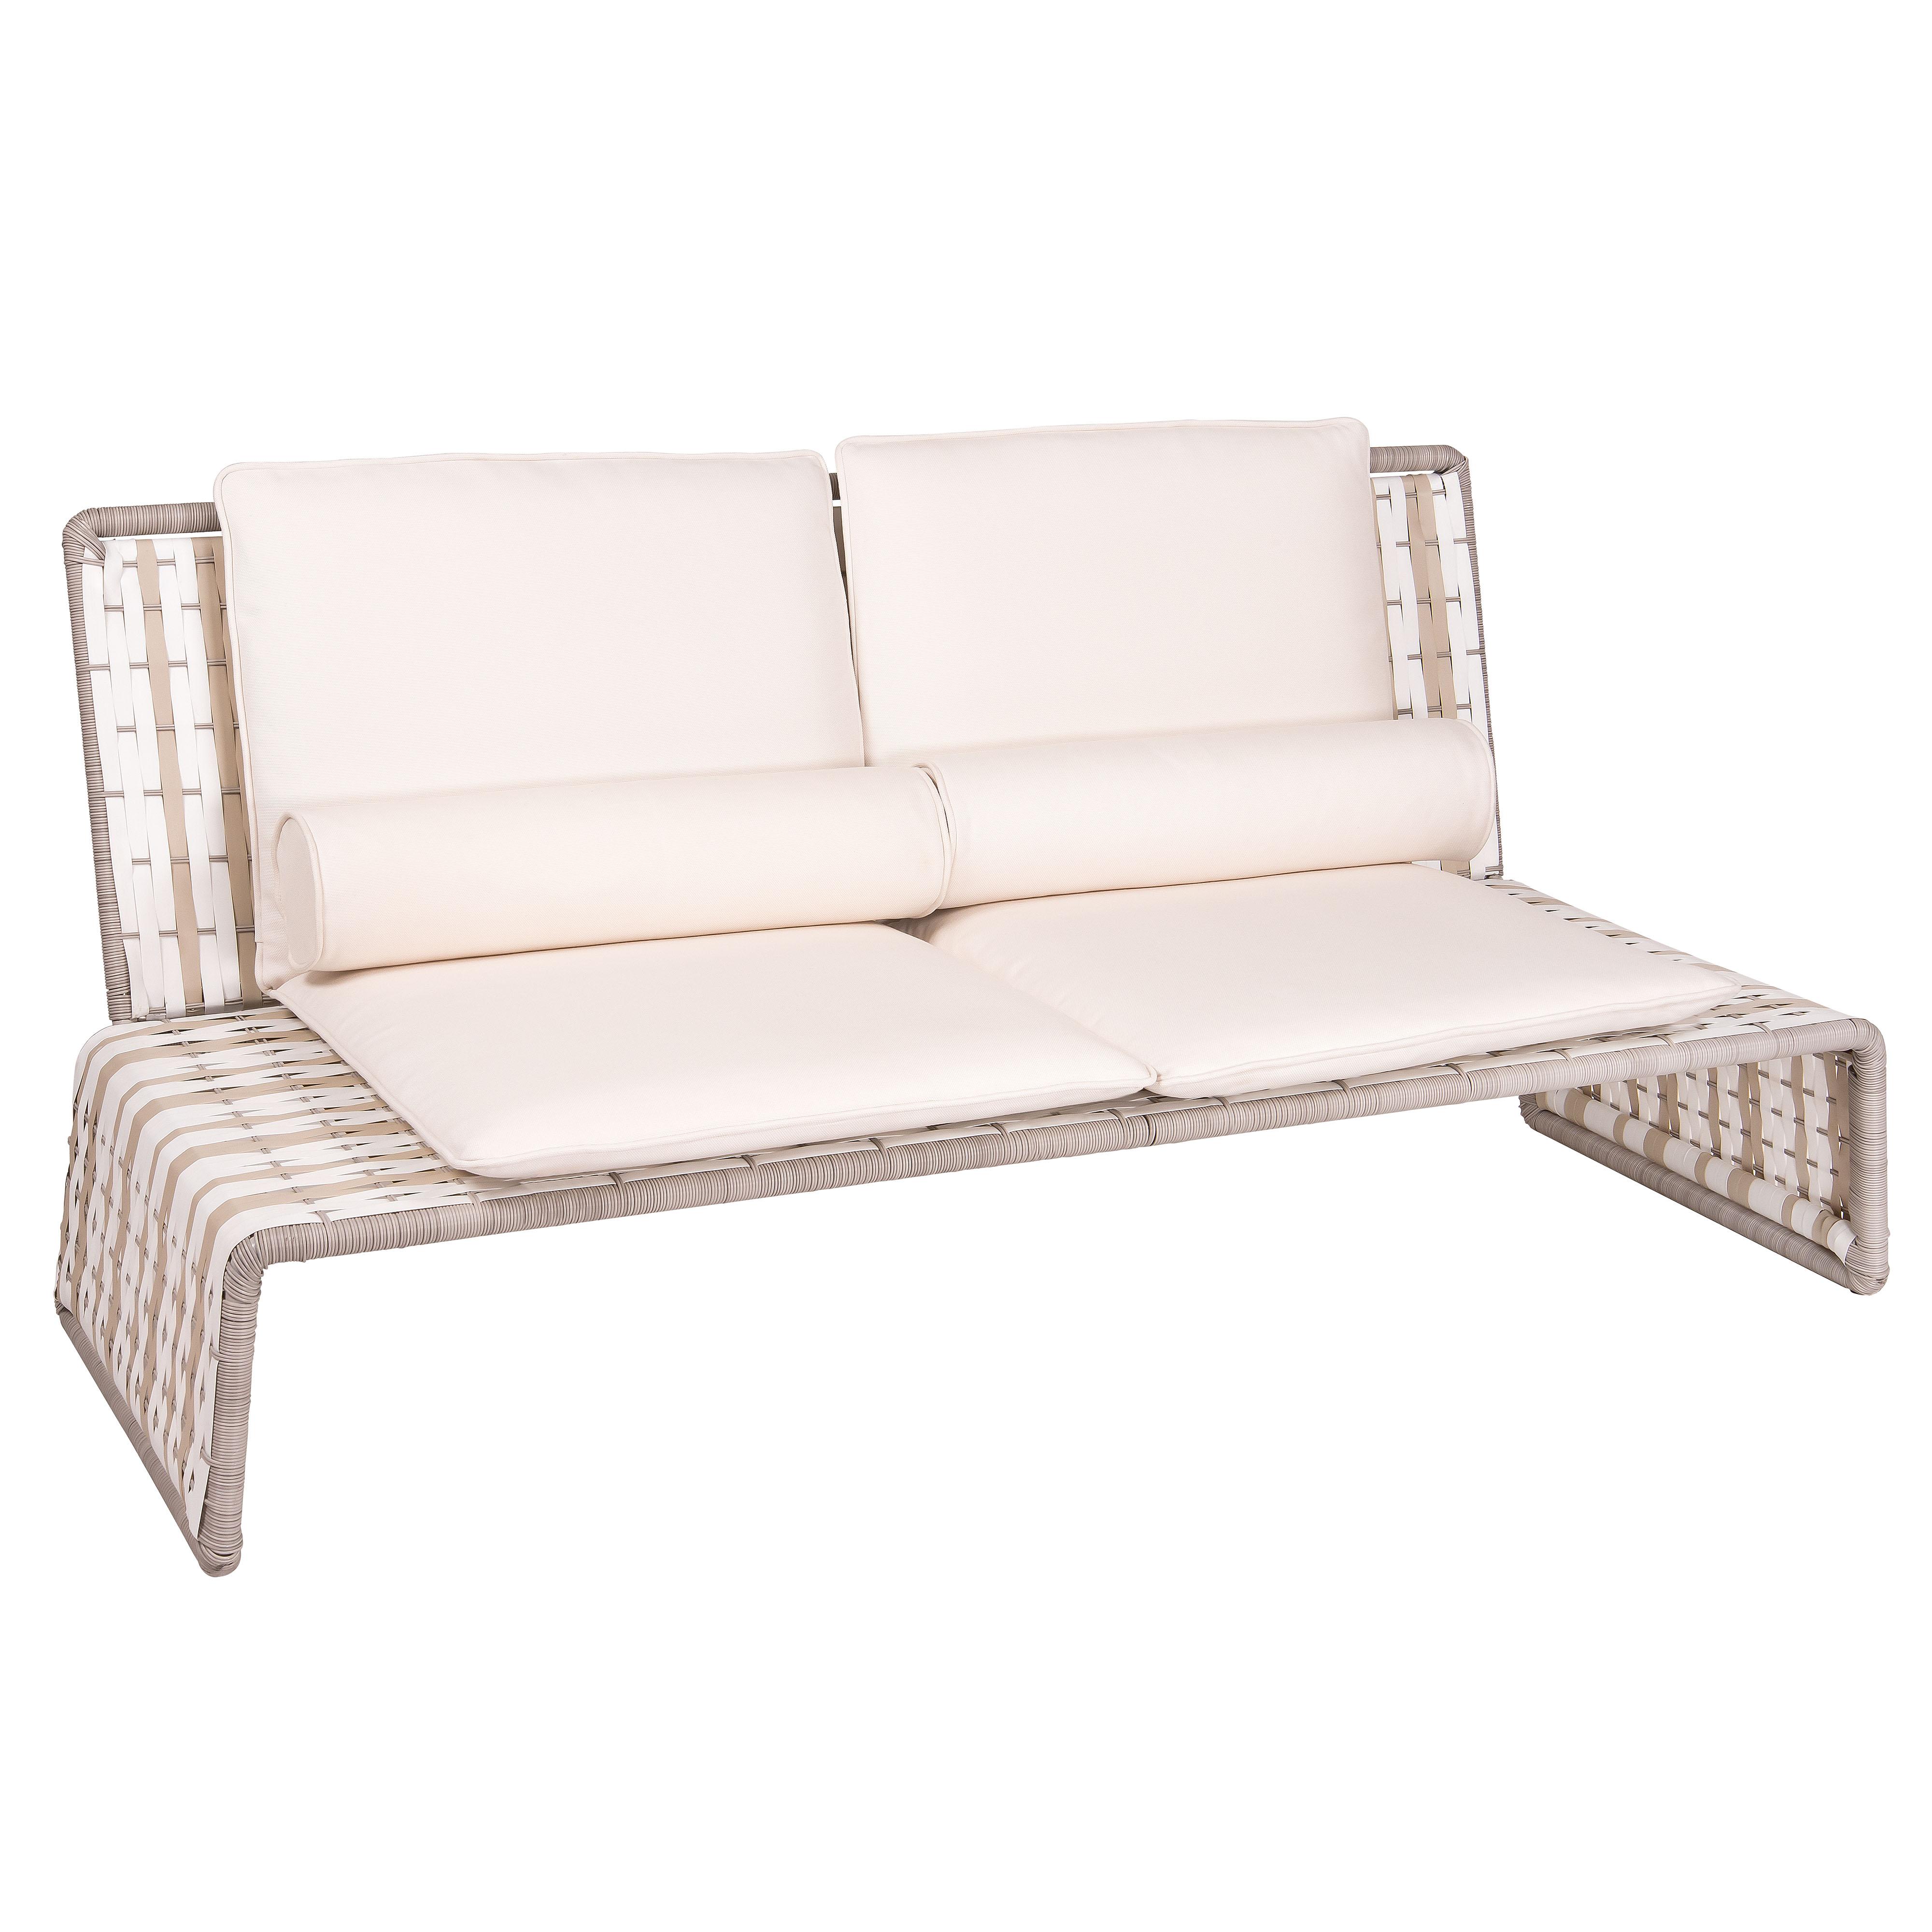 Tabloid Contemporary Outdoor Love Seat